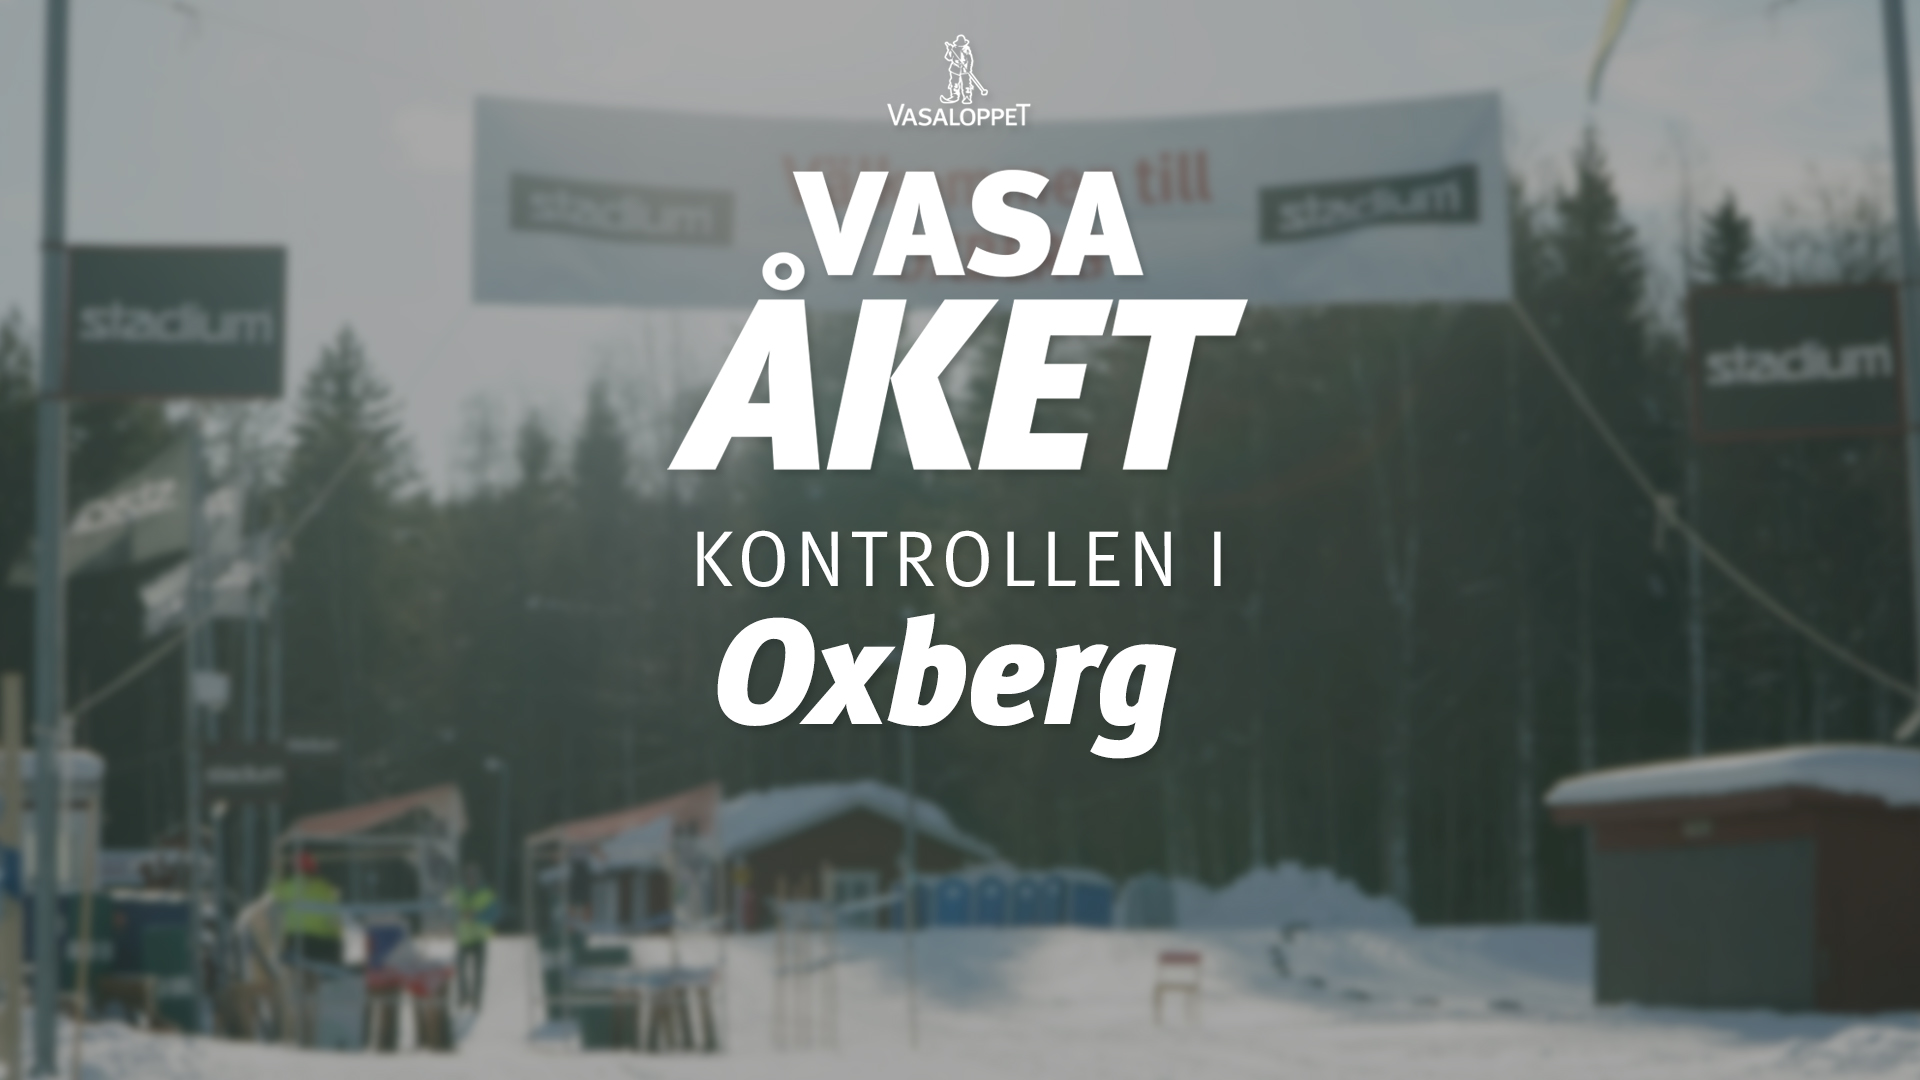 26 februari, 2021 – Oxberg